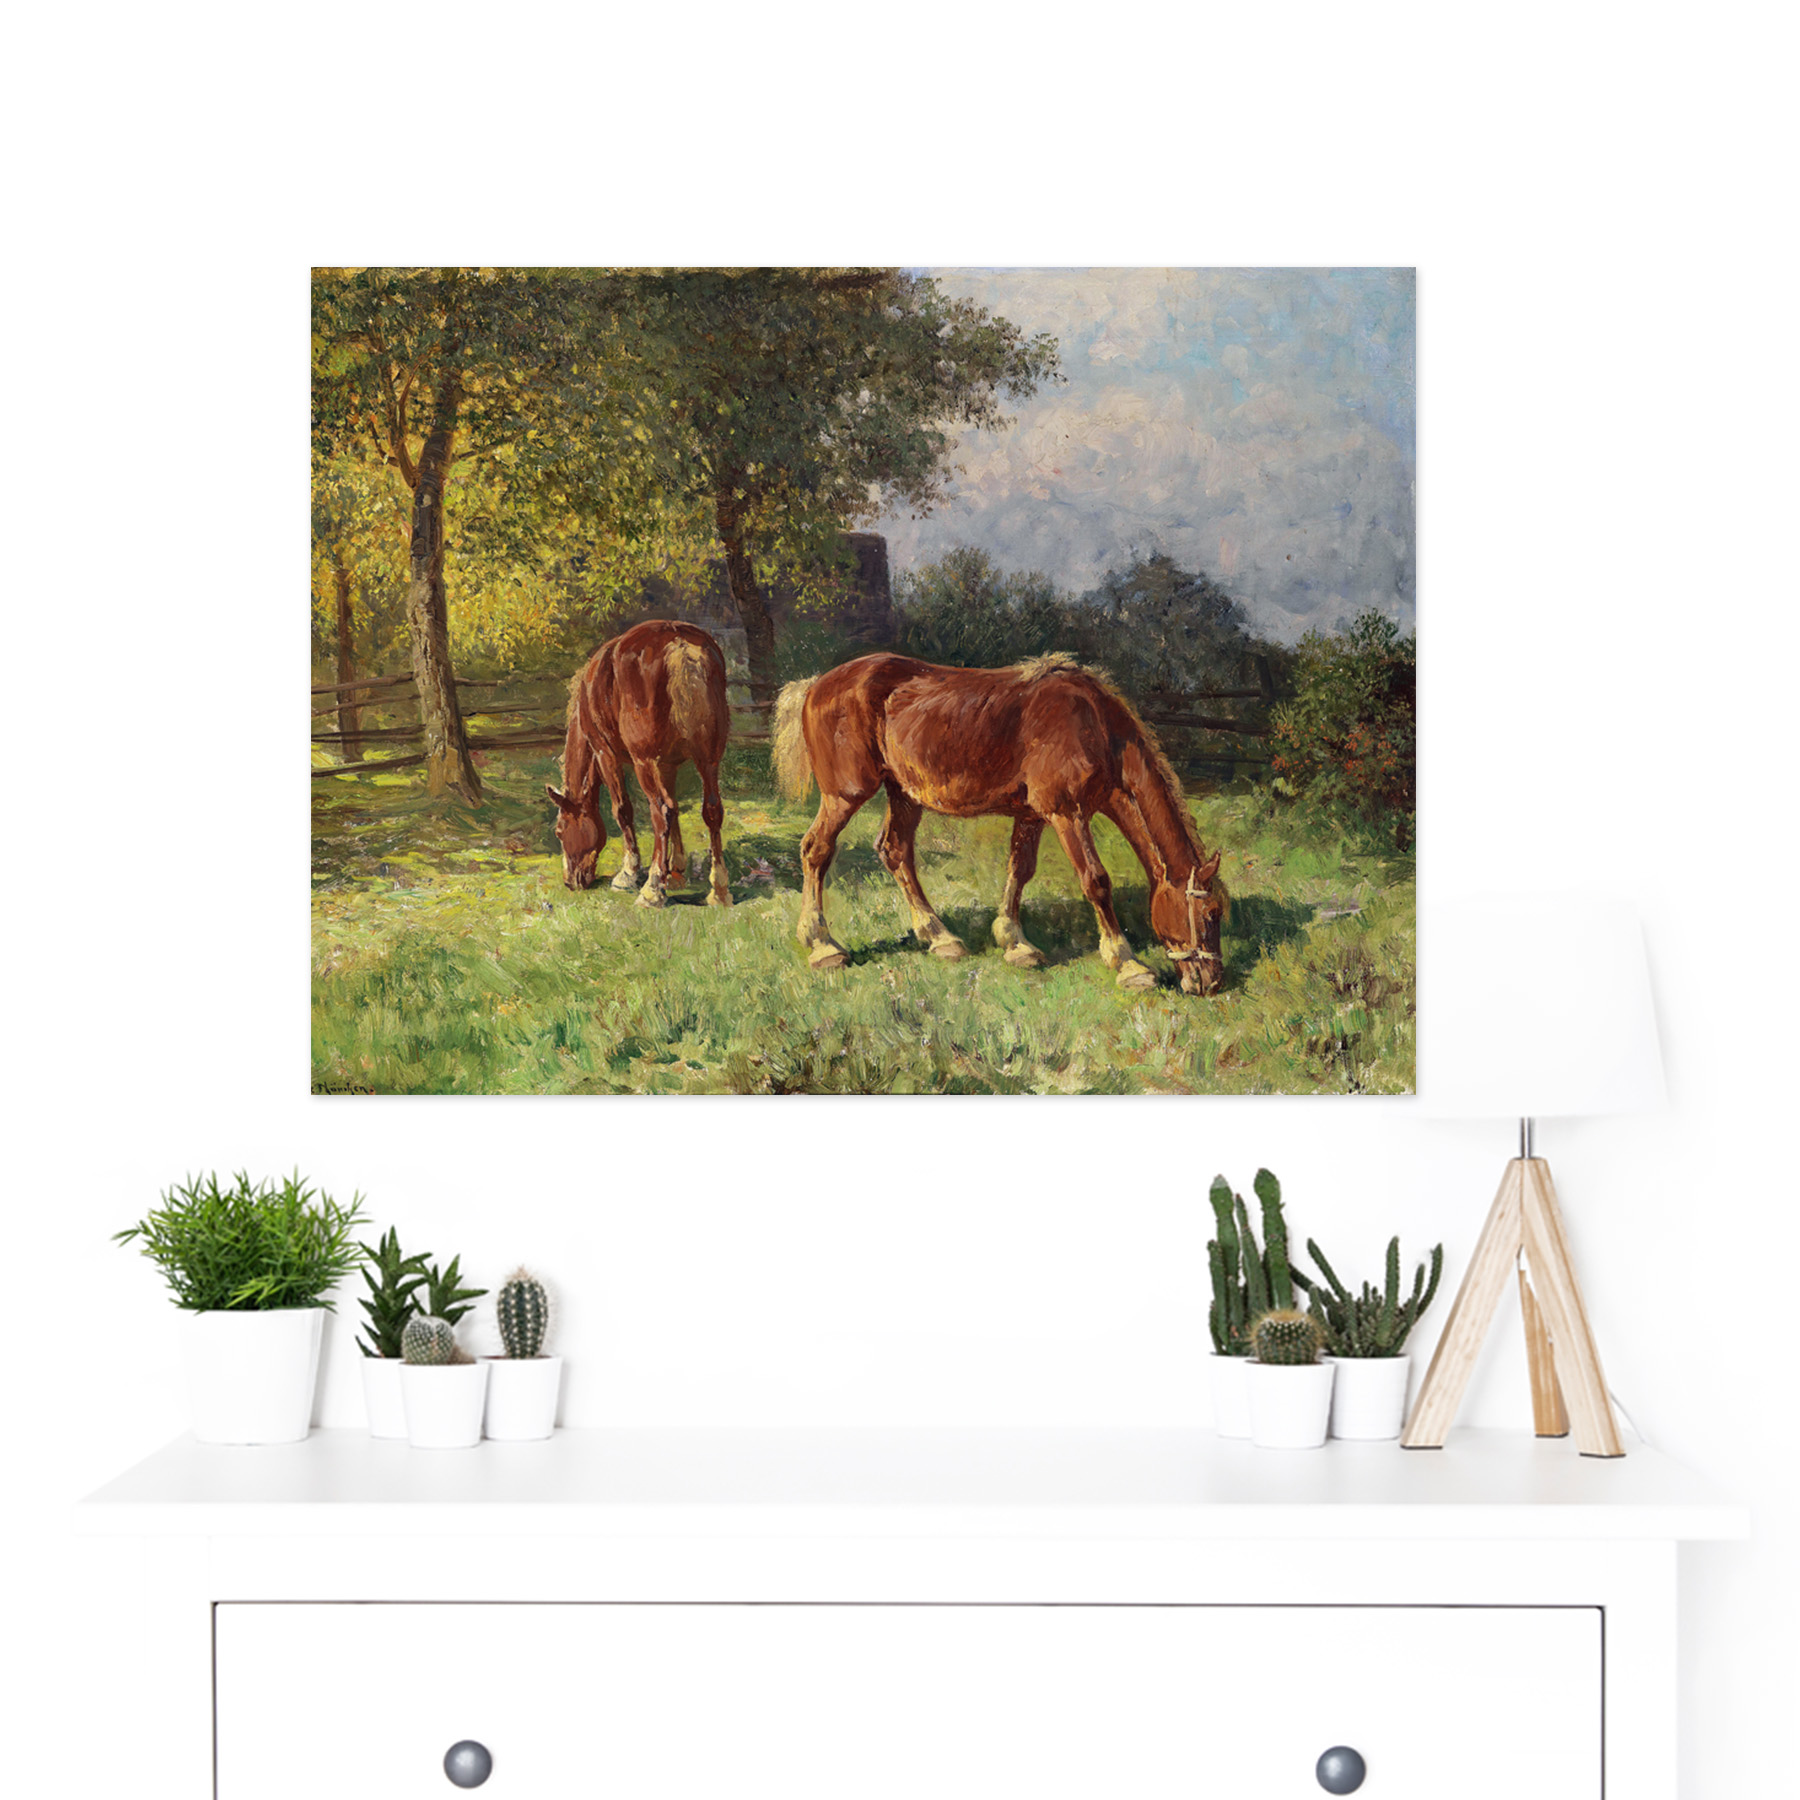 Van-Der-Venne-Horses-In-Pasture-Painting-Large-Framed-Art-Print thumbnail 3